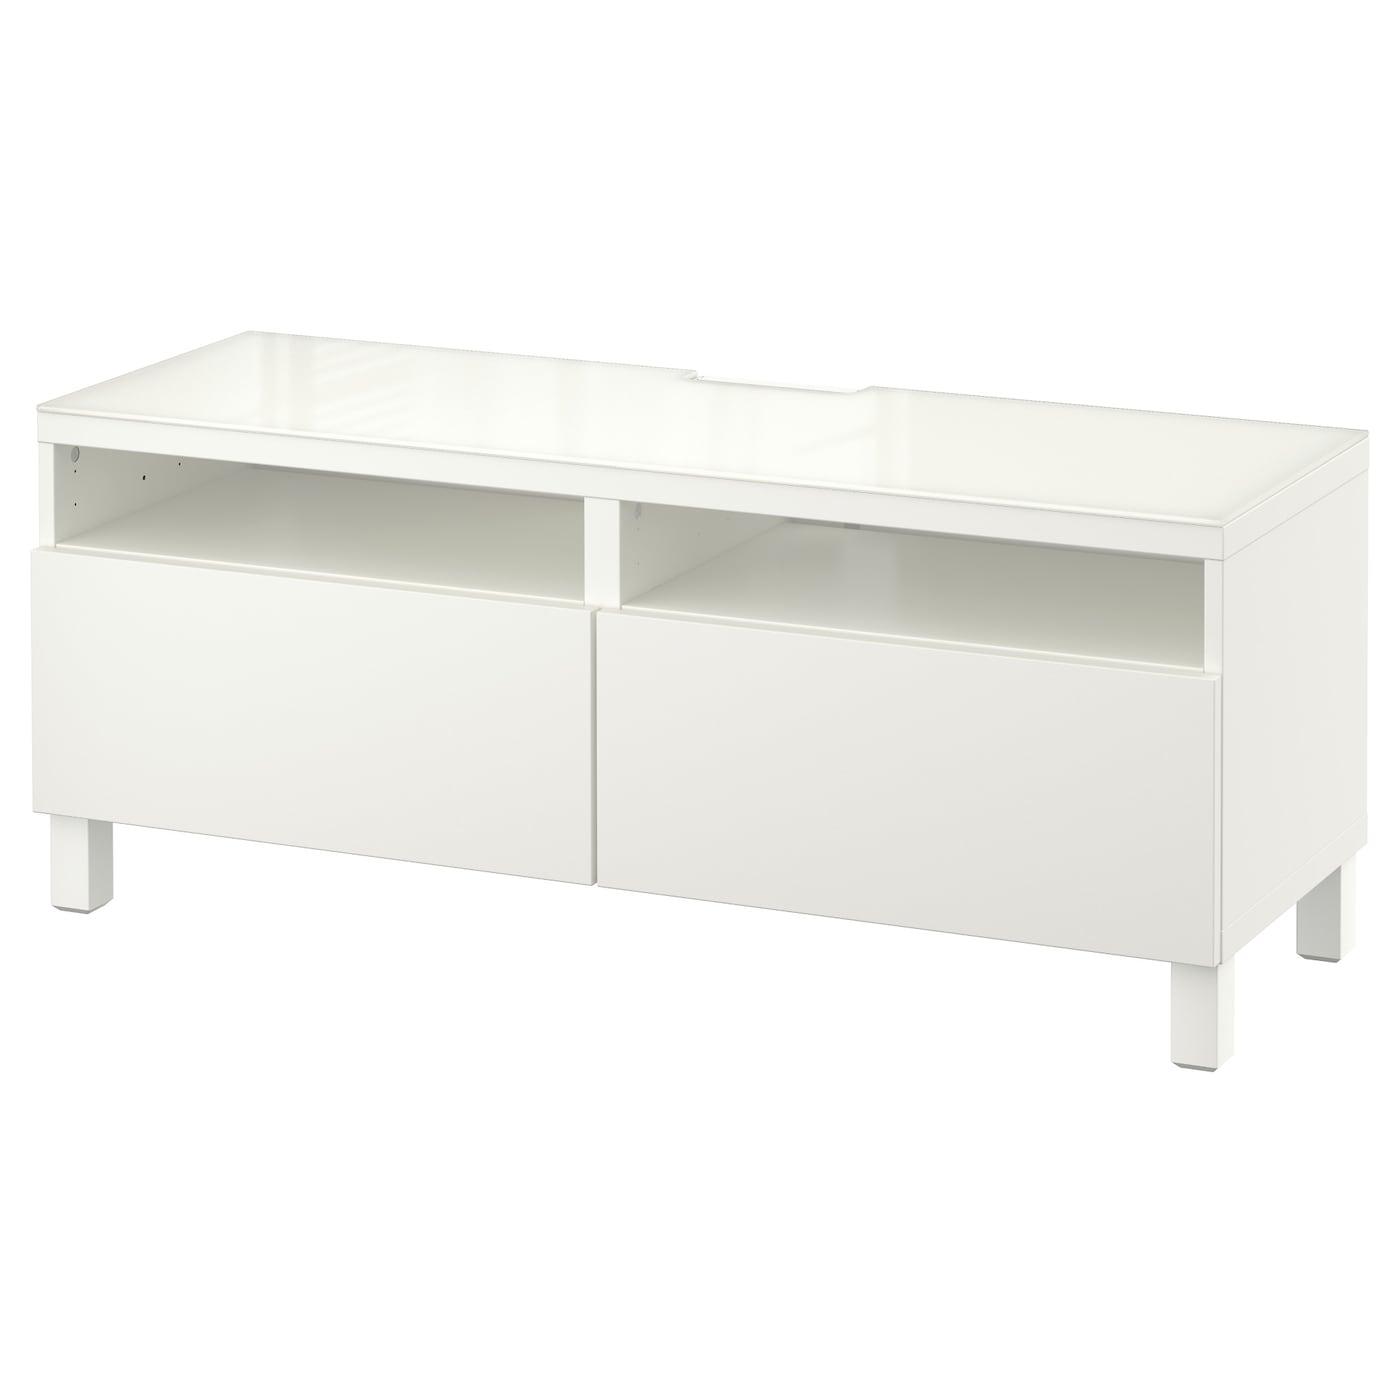 BESTÅ Mueble TV con almacenaje Lappviken blanco 120 x 40 x 48 cm - IKEA